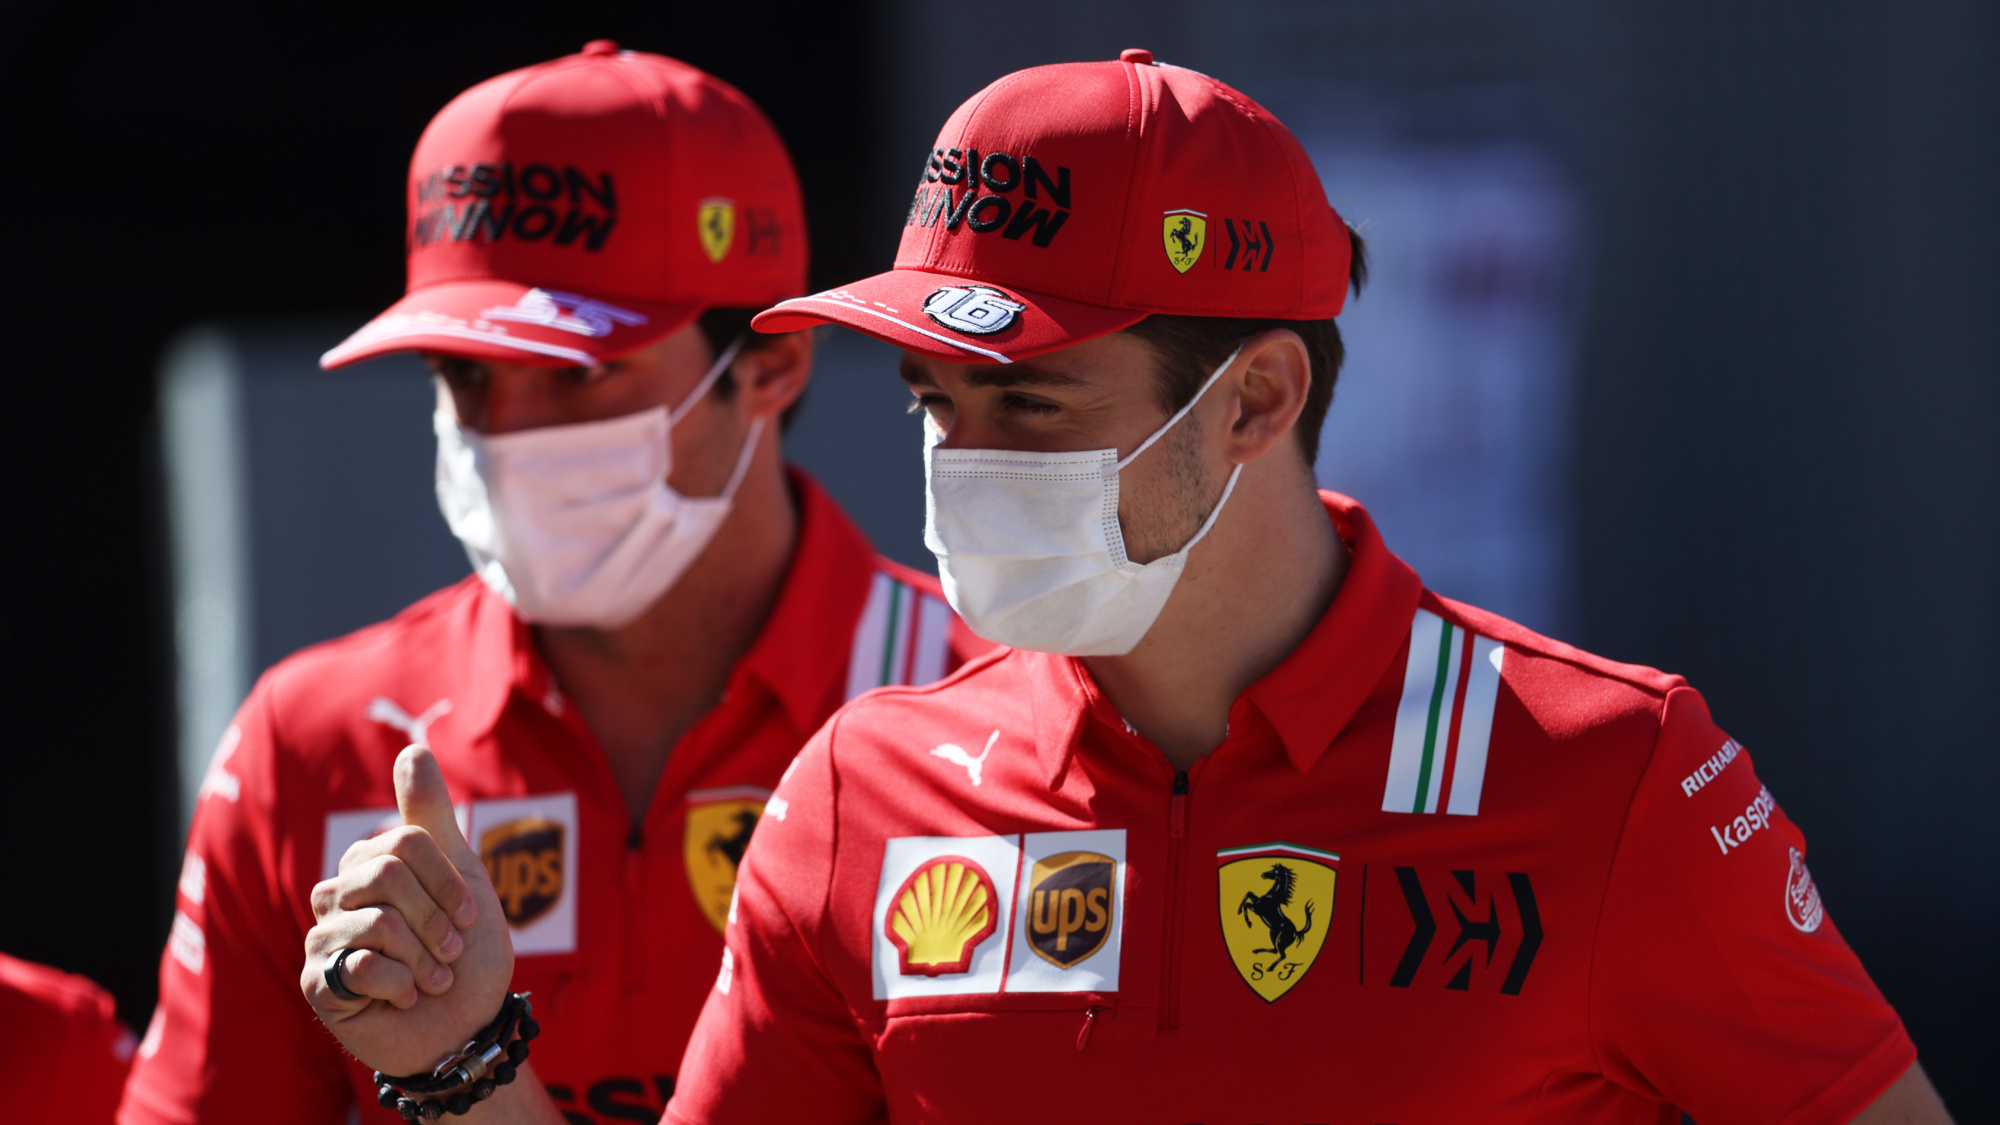 Charles Leclerc, 2021 Monaco GP